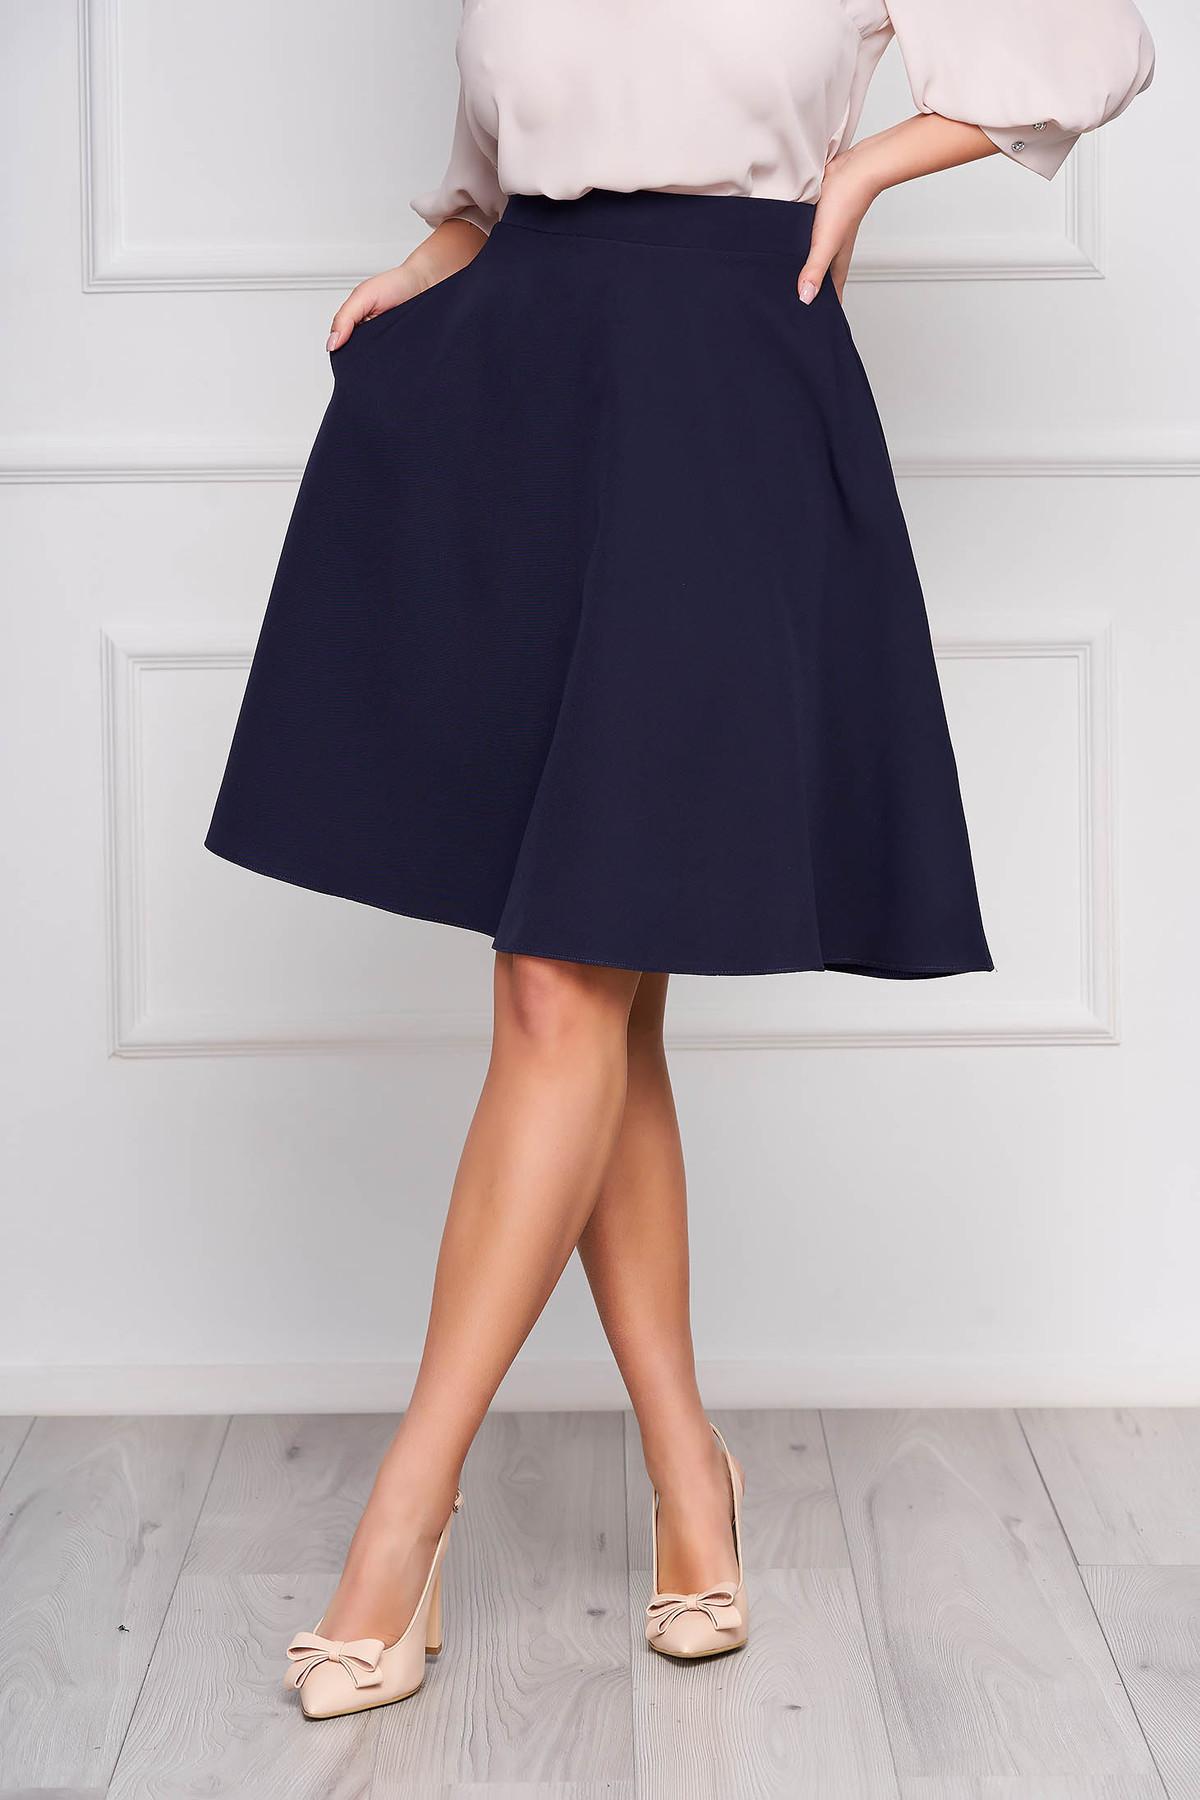 Fusta StarShinerS albastra-inchis eleganta in clos cu talie inalta din stofa usor elastica